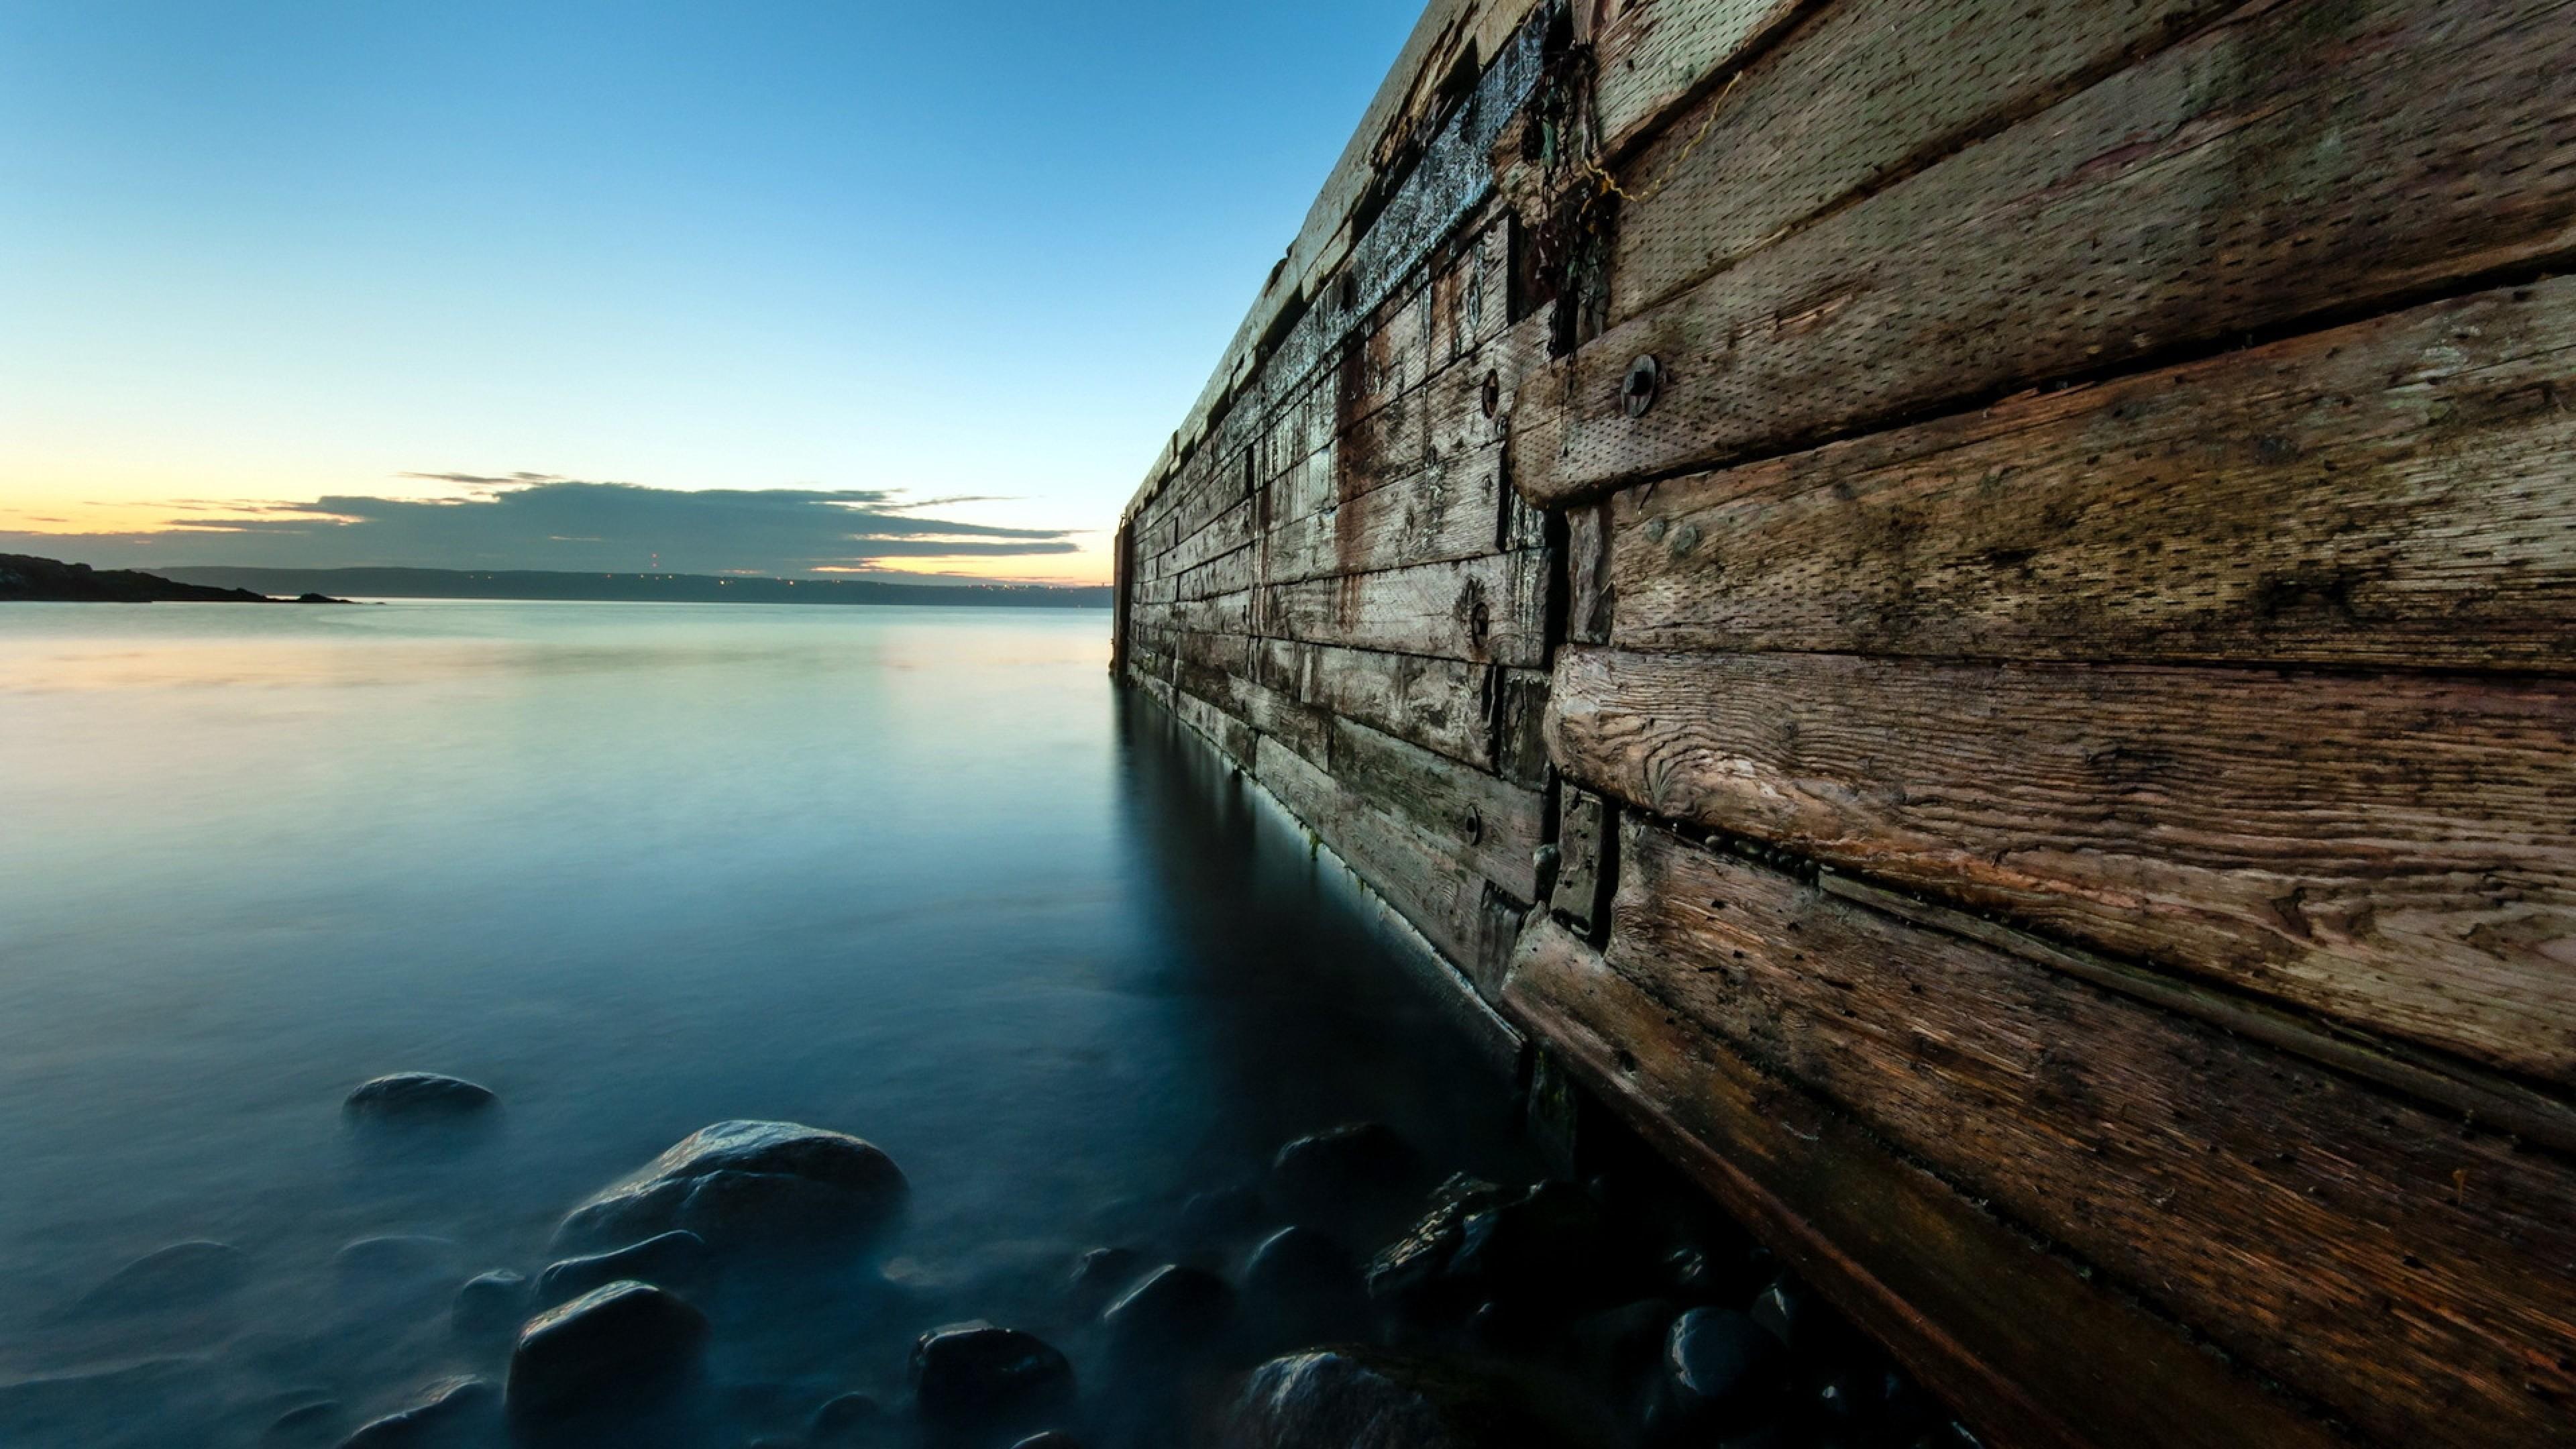 4K Landscape Wallpaper | Backgrounds | Photos | Images ...